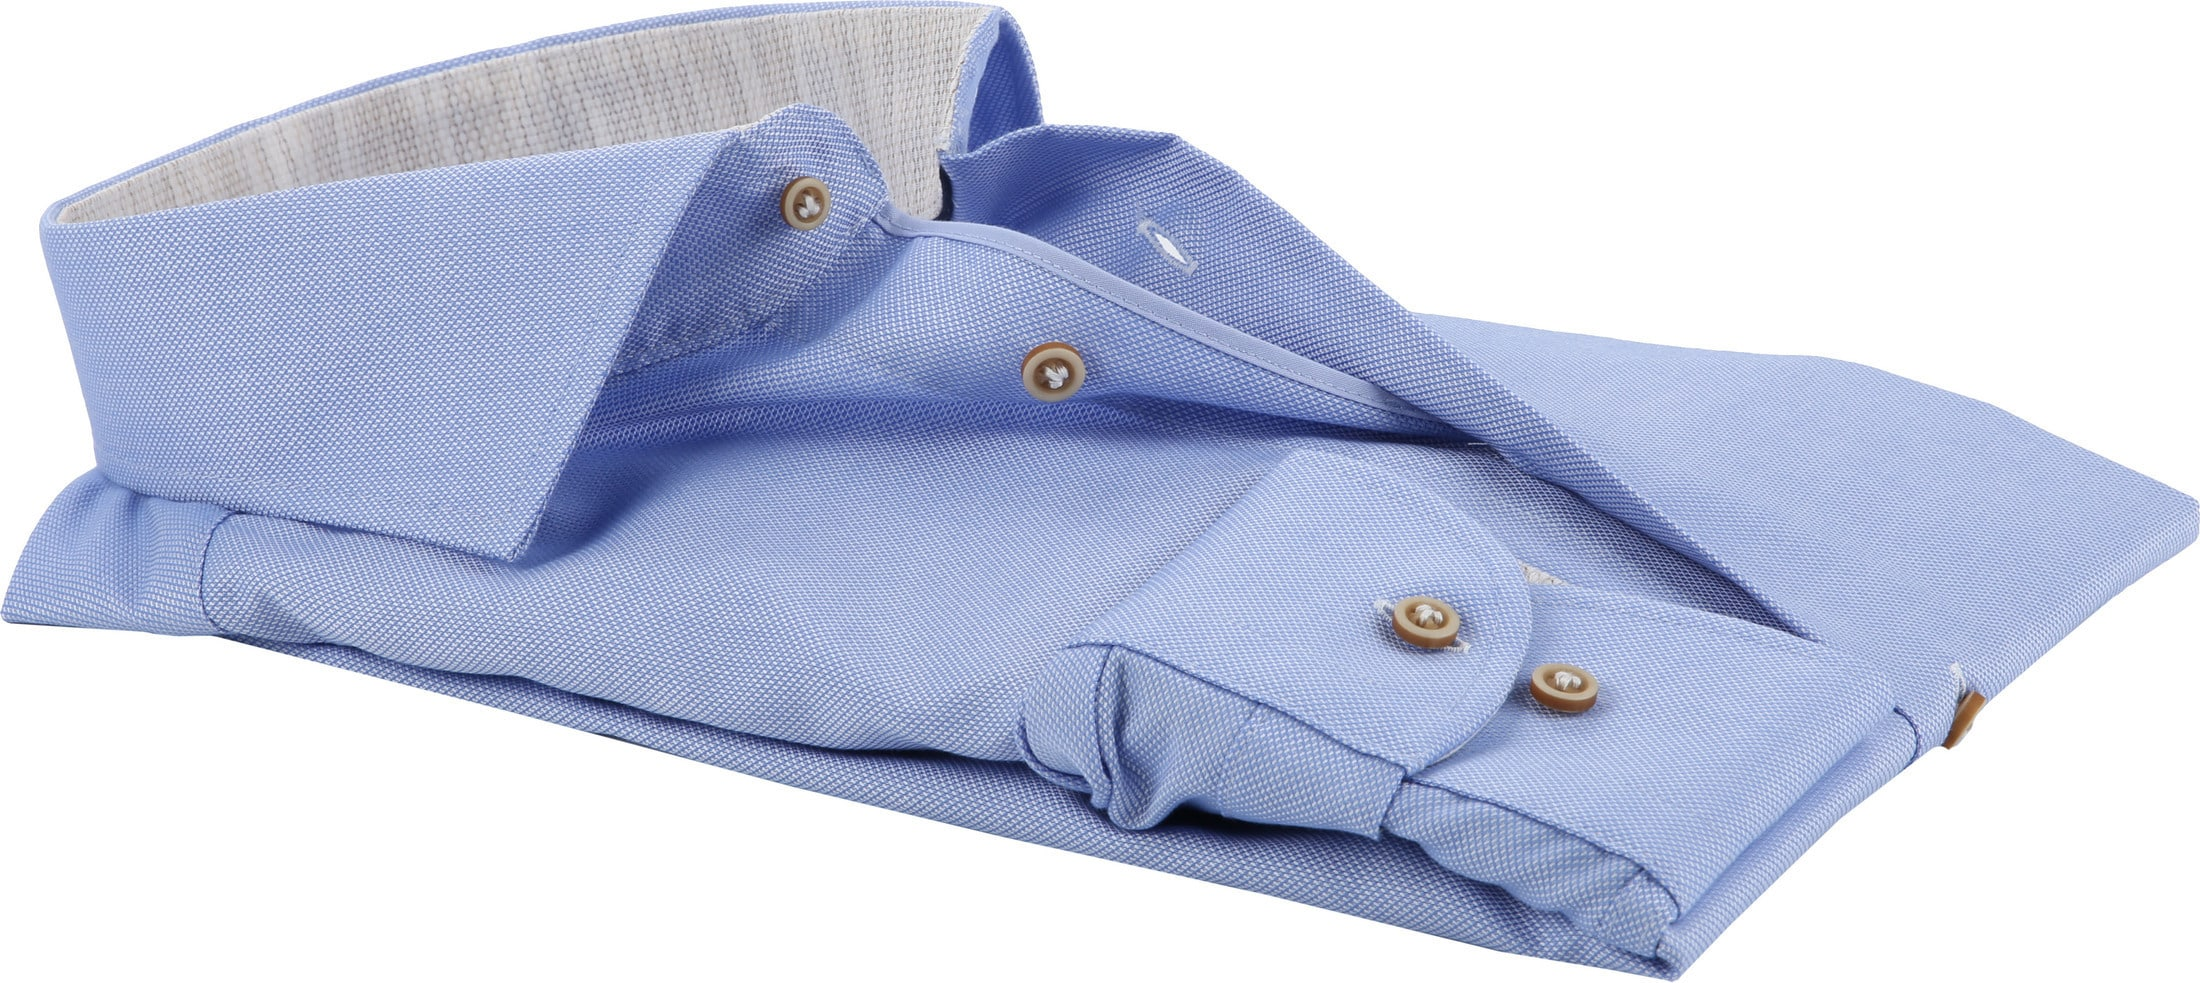 Profuomo Overhemd Blauw CAW foto 2